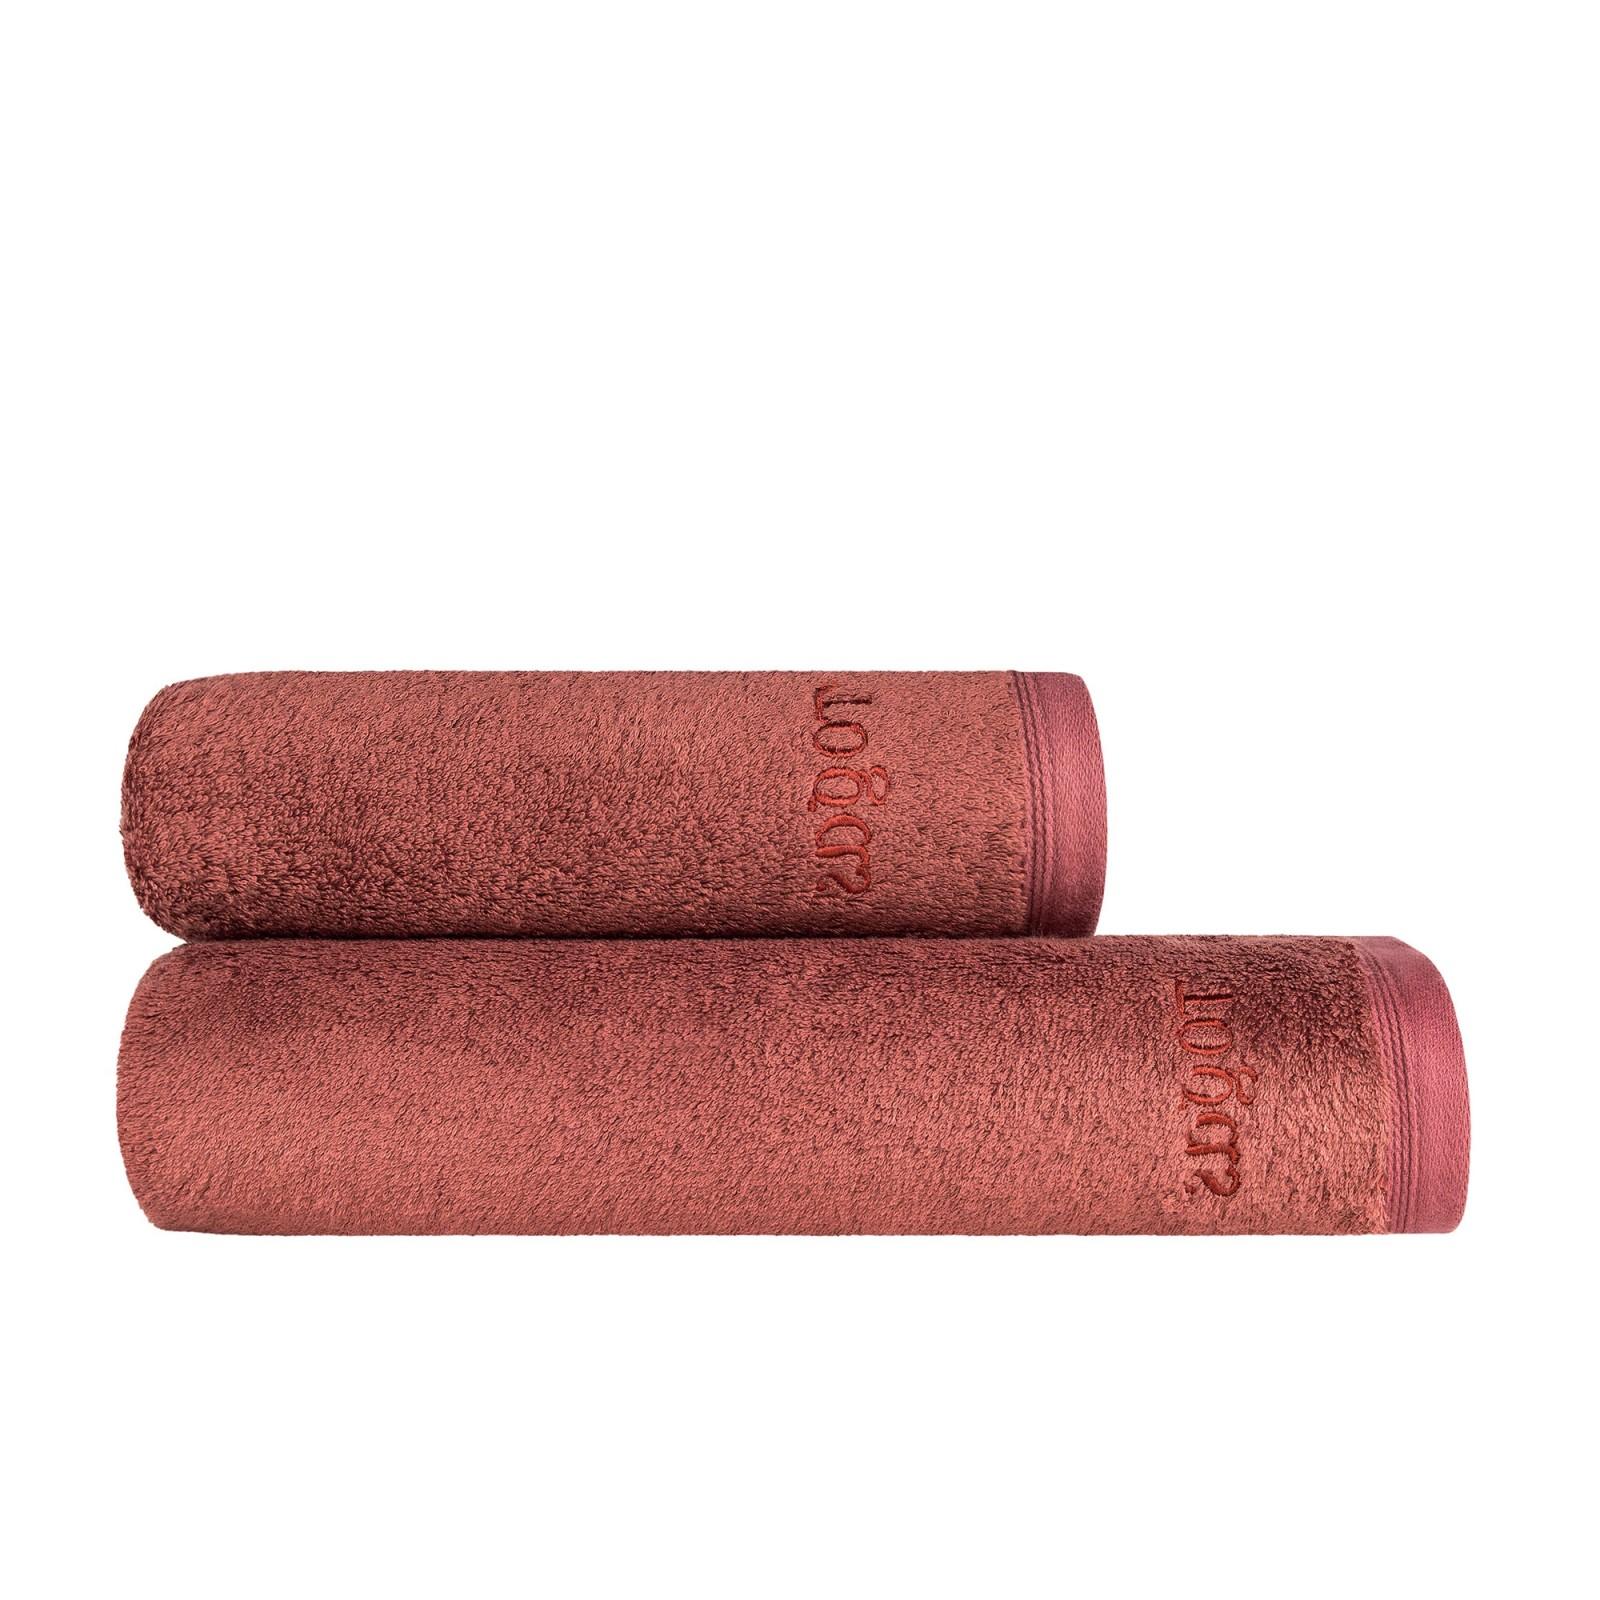 Полотенца Togas Полотенце Пуатье Цвет: Марсала (50х100 см)